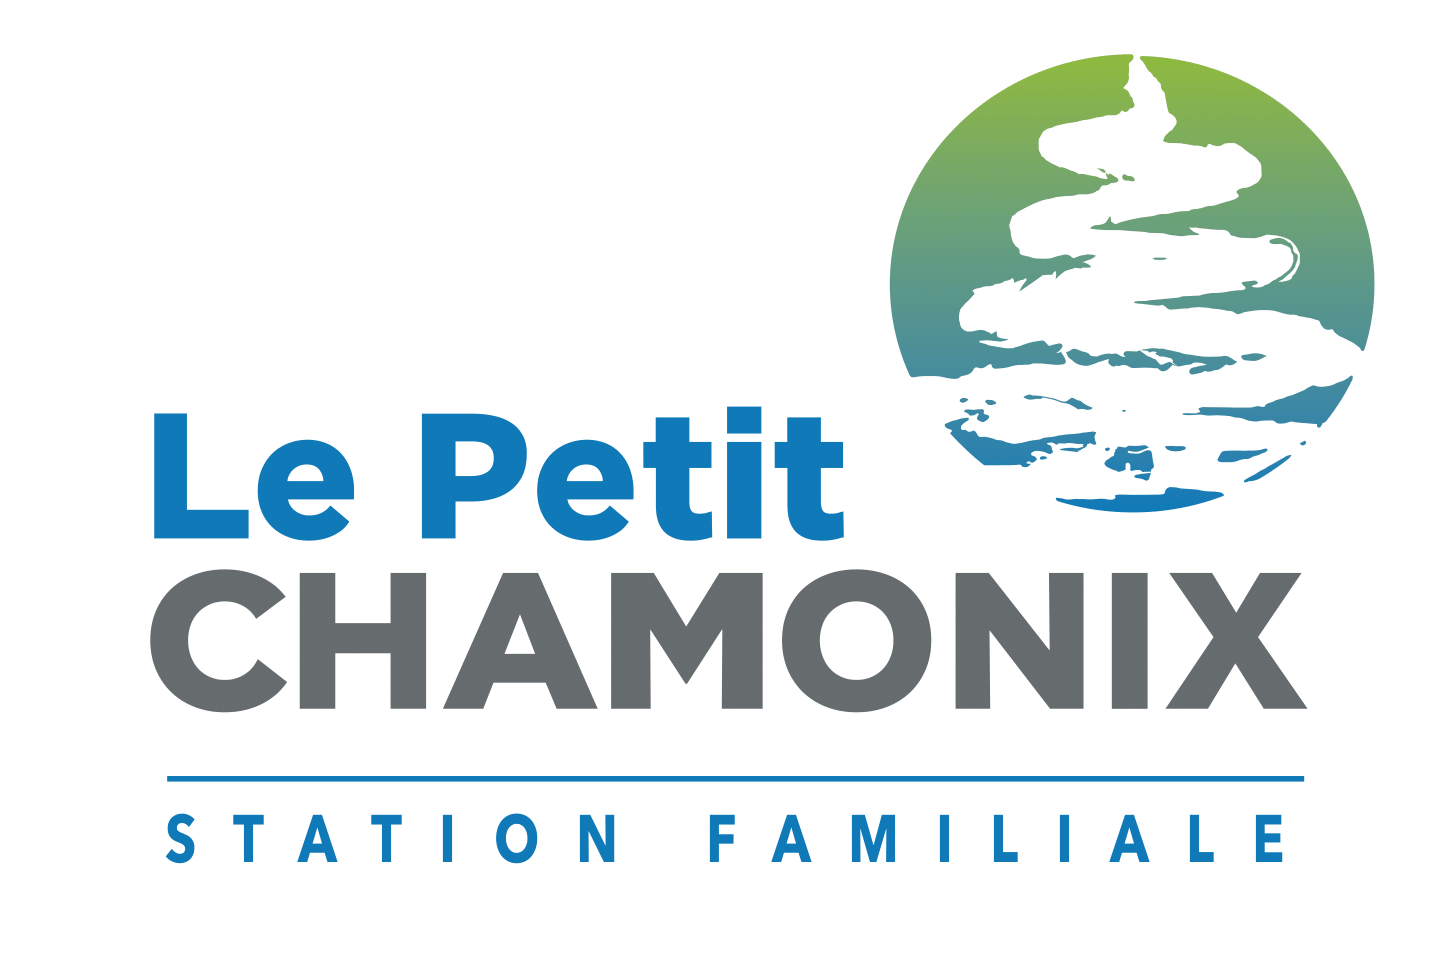 Le Petit Chamonix